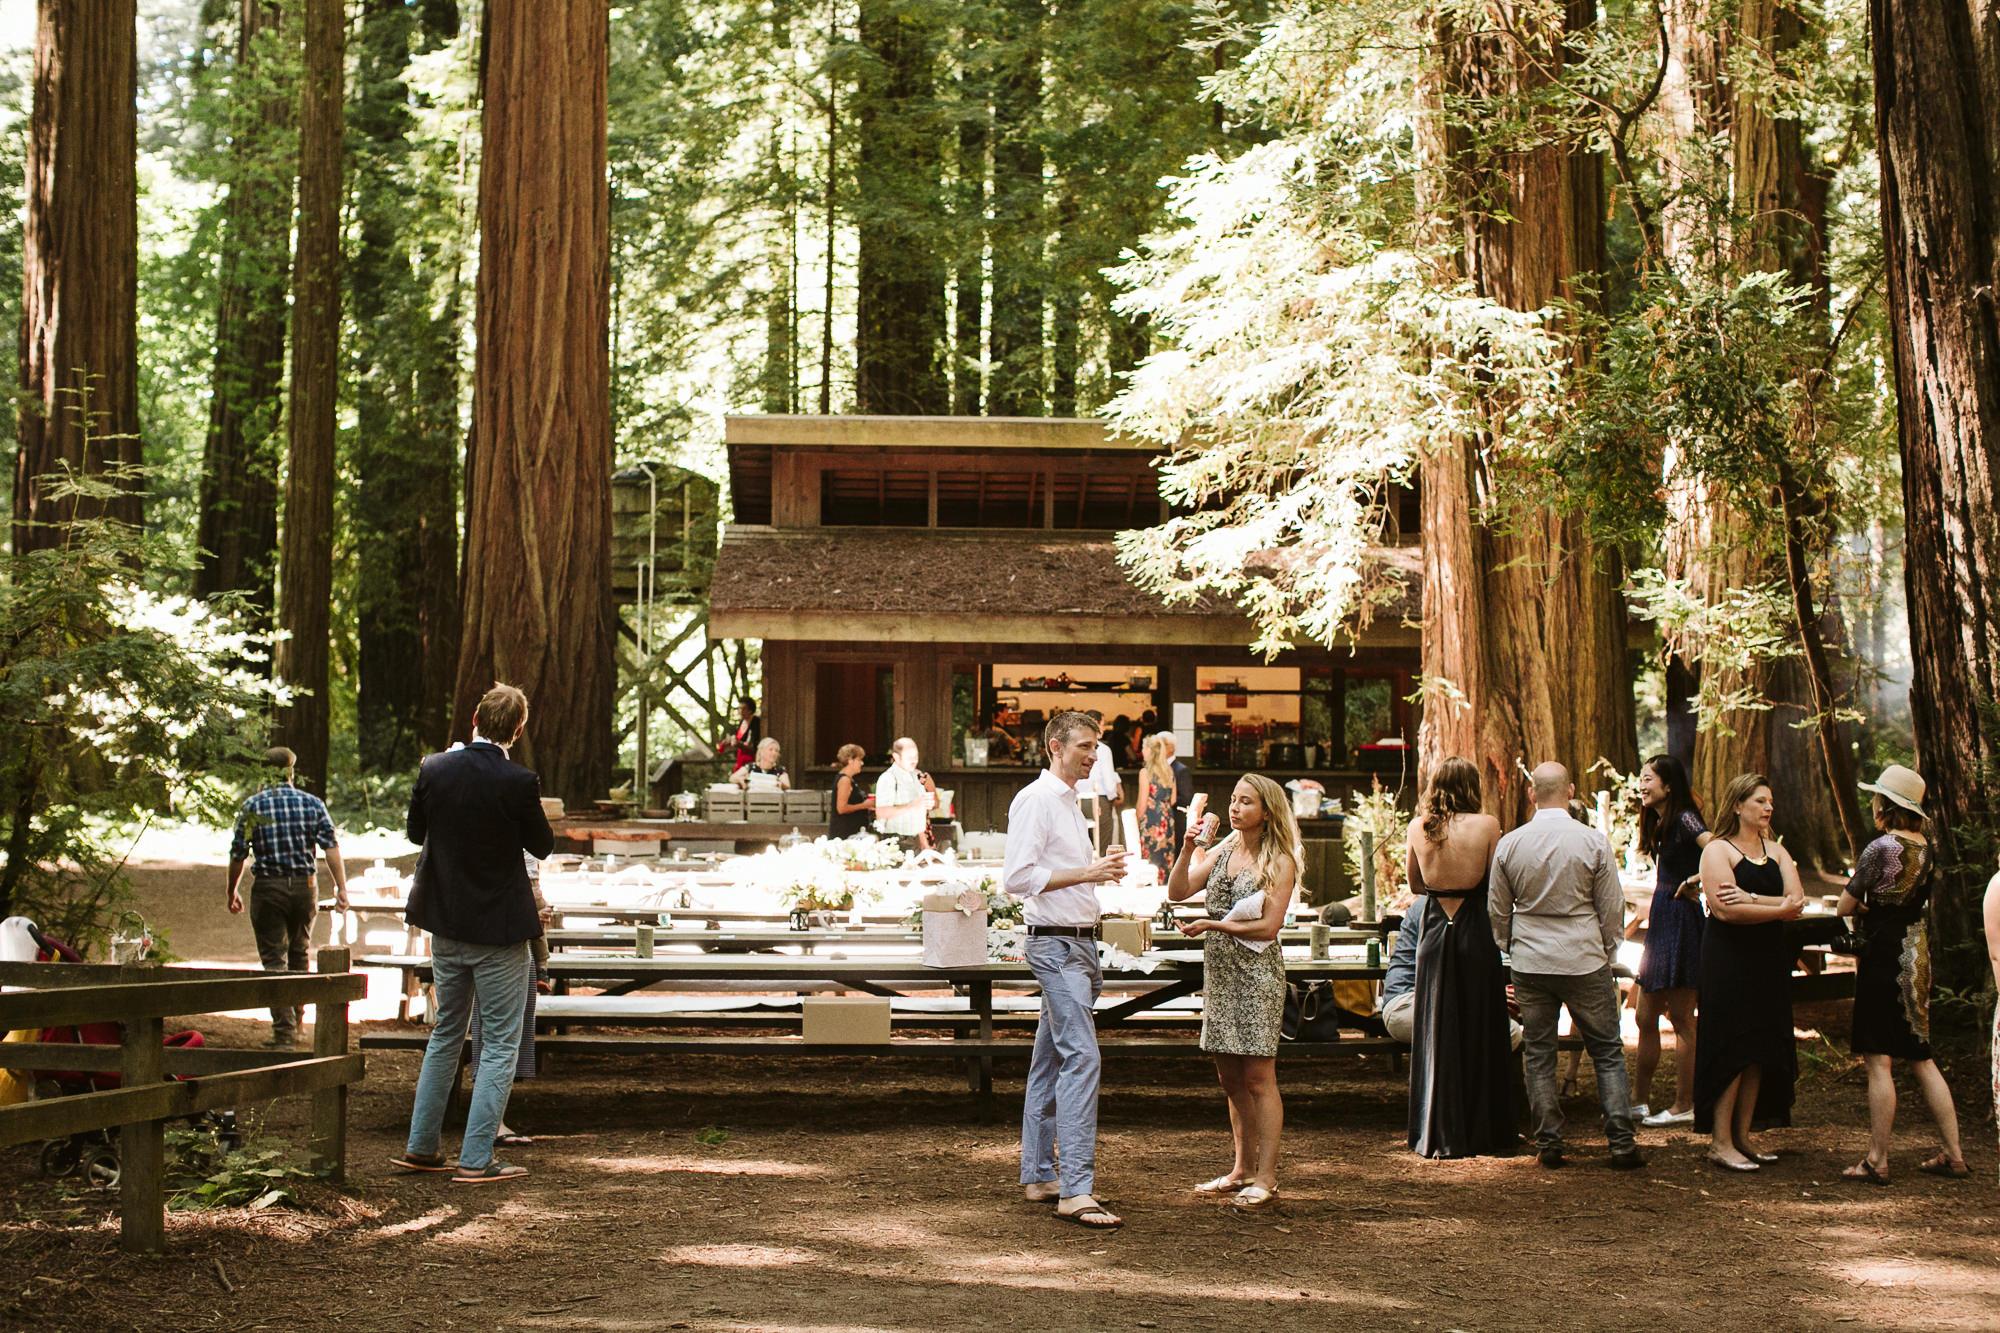 California-wedding-photographer-alfonso-flores-pamplin-groove-160.jpg